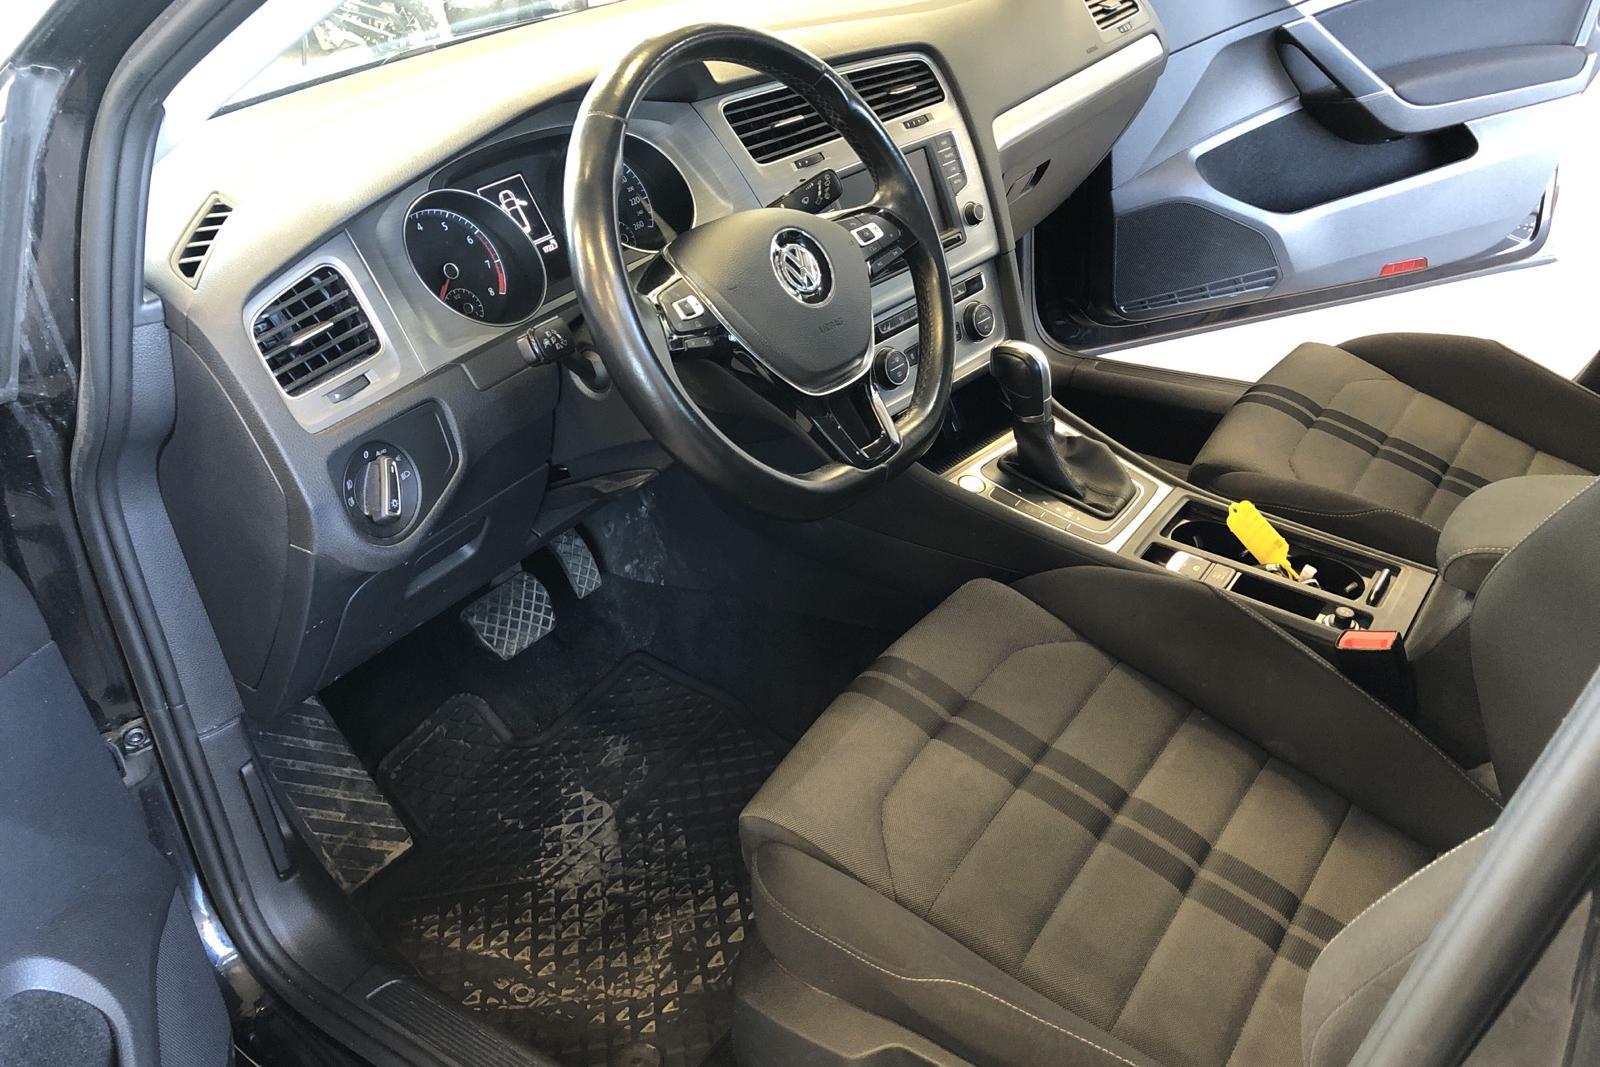 VW Golf VII 1.4 TGI BlueMotion Sportscombi (110hk) - 73 980 km - Automatic - black - 2017